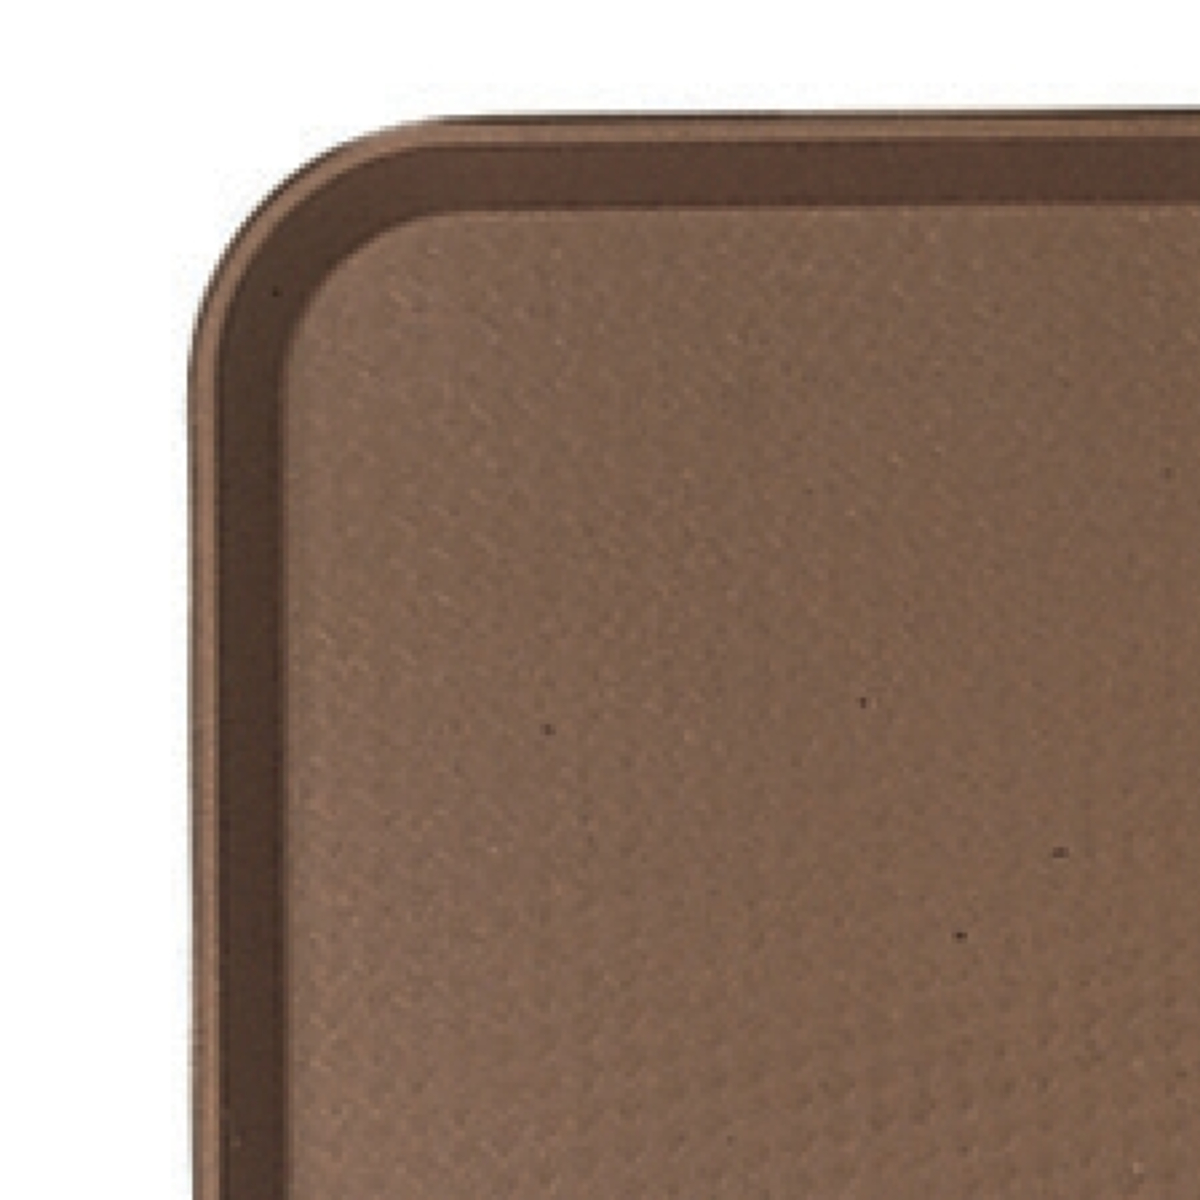 Plateau marron plastique bord droit Fast Food Cambro